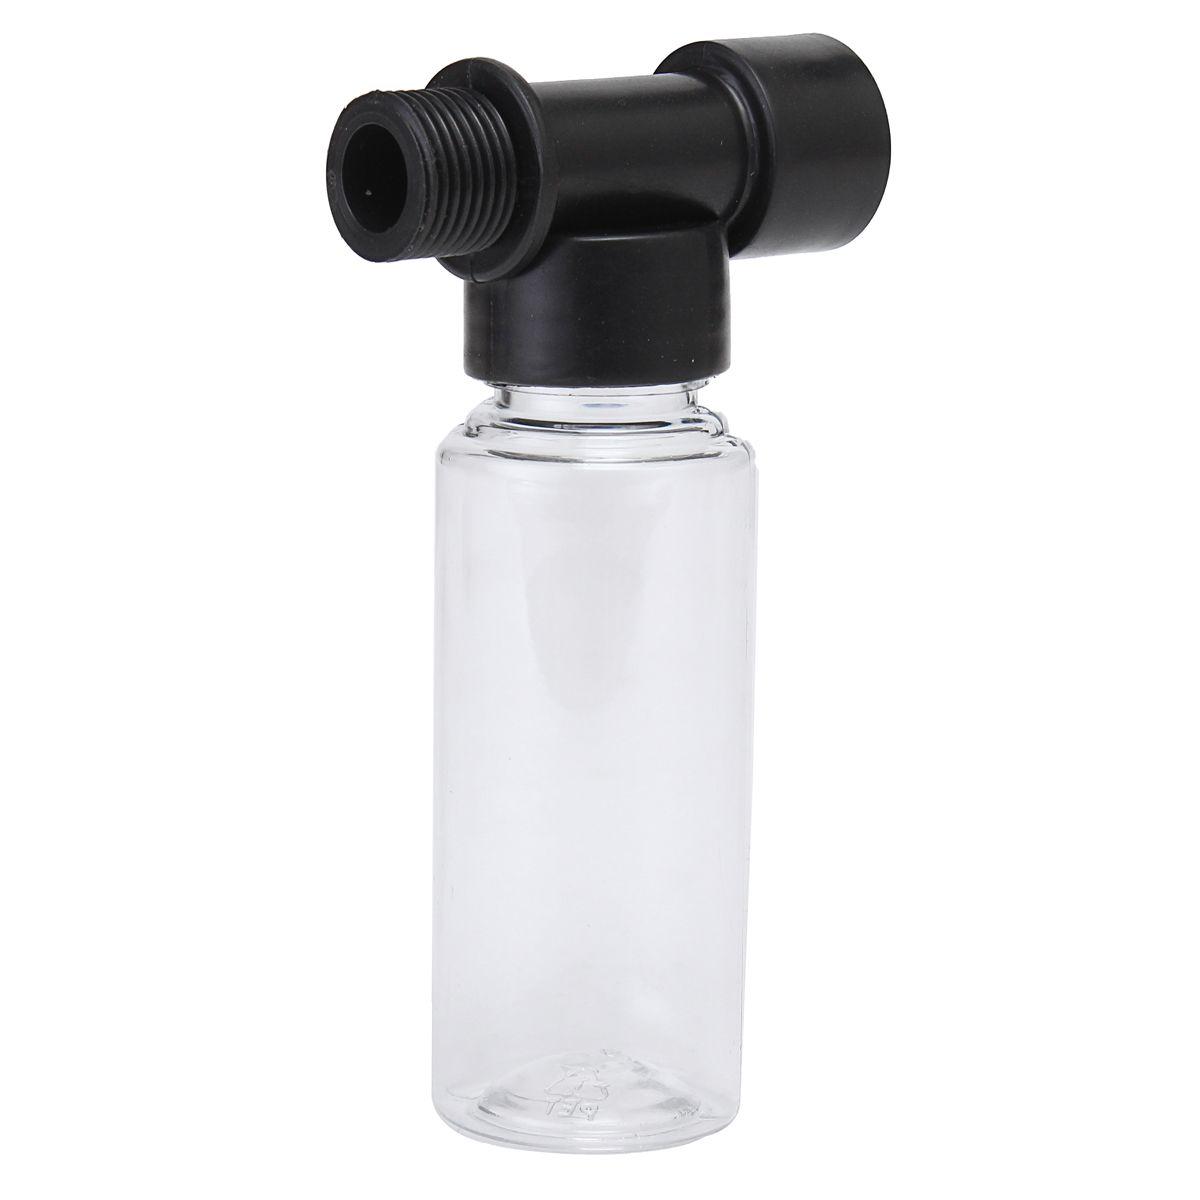 60mL Bubble Pot Car Wash High Pressure Power Washer Sprayer Spray Nozzle Gun Bottle